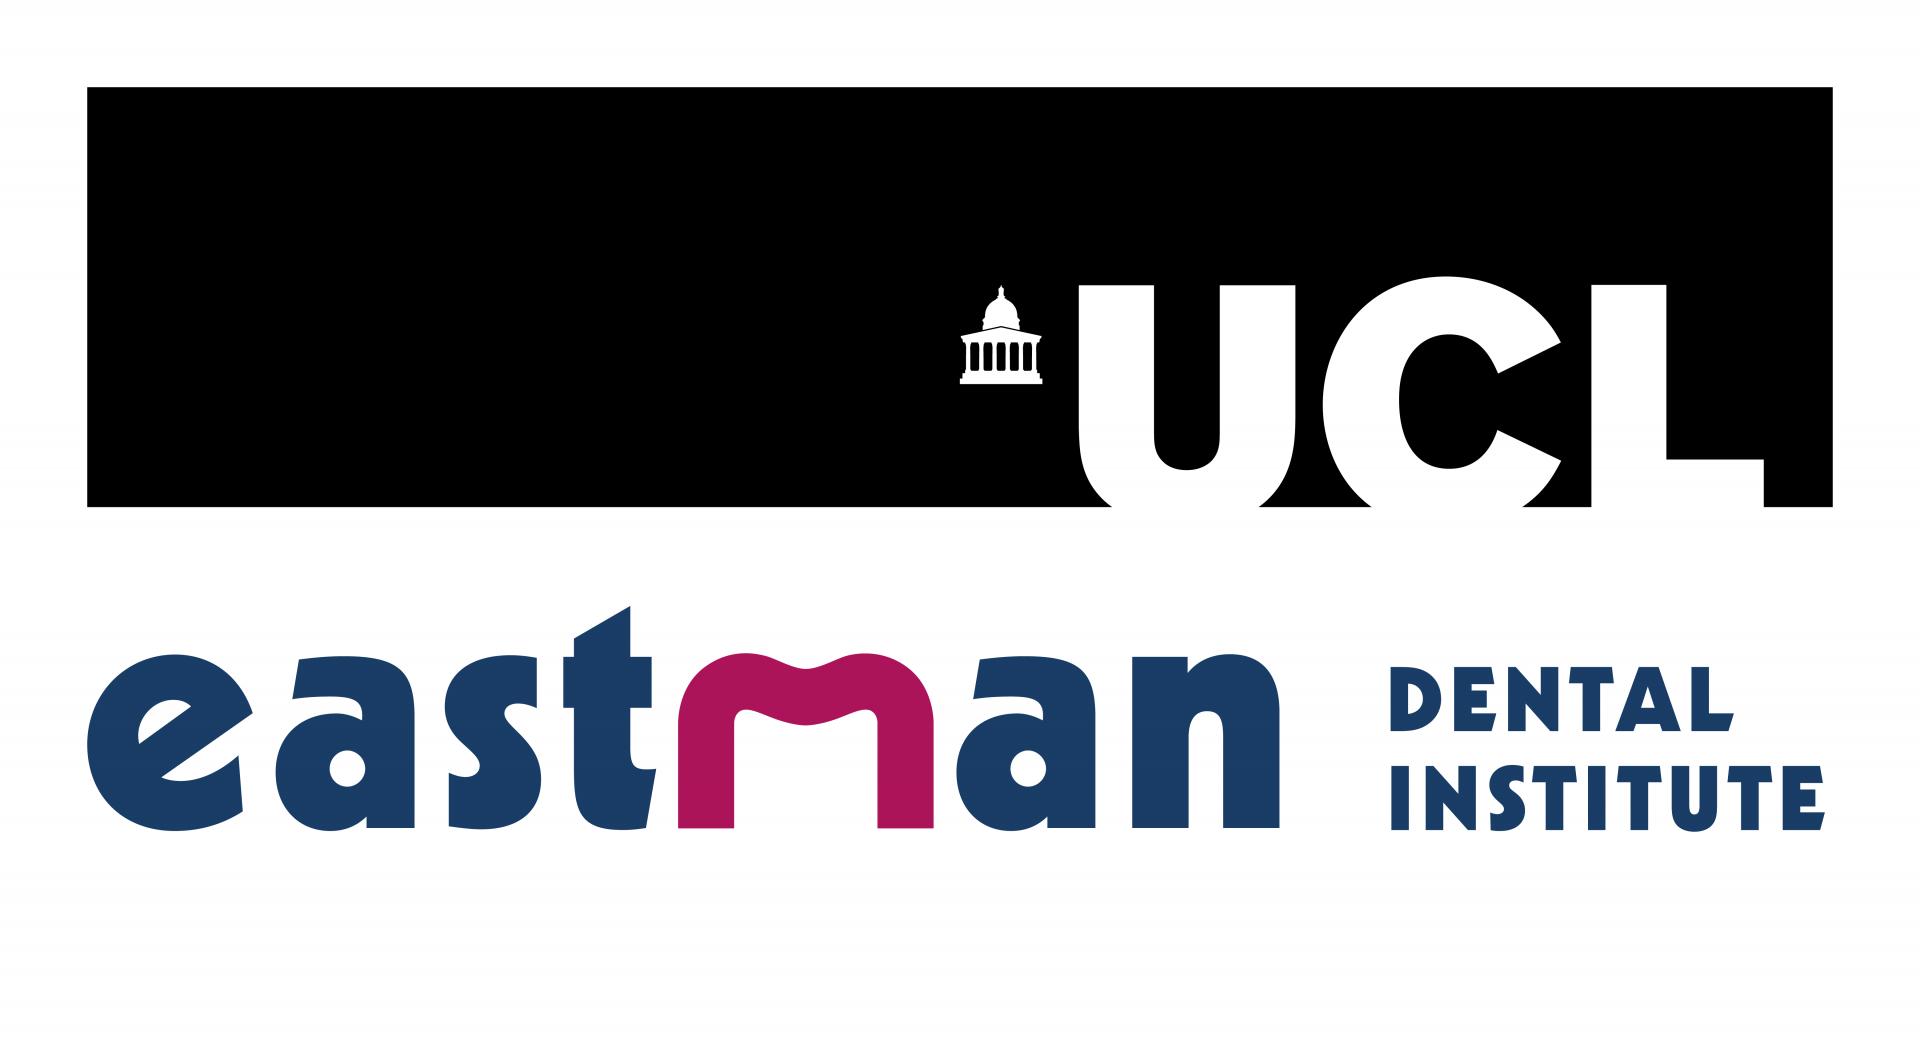 UCL Eastman Dental Institute logo